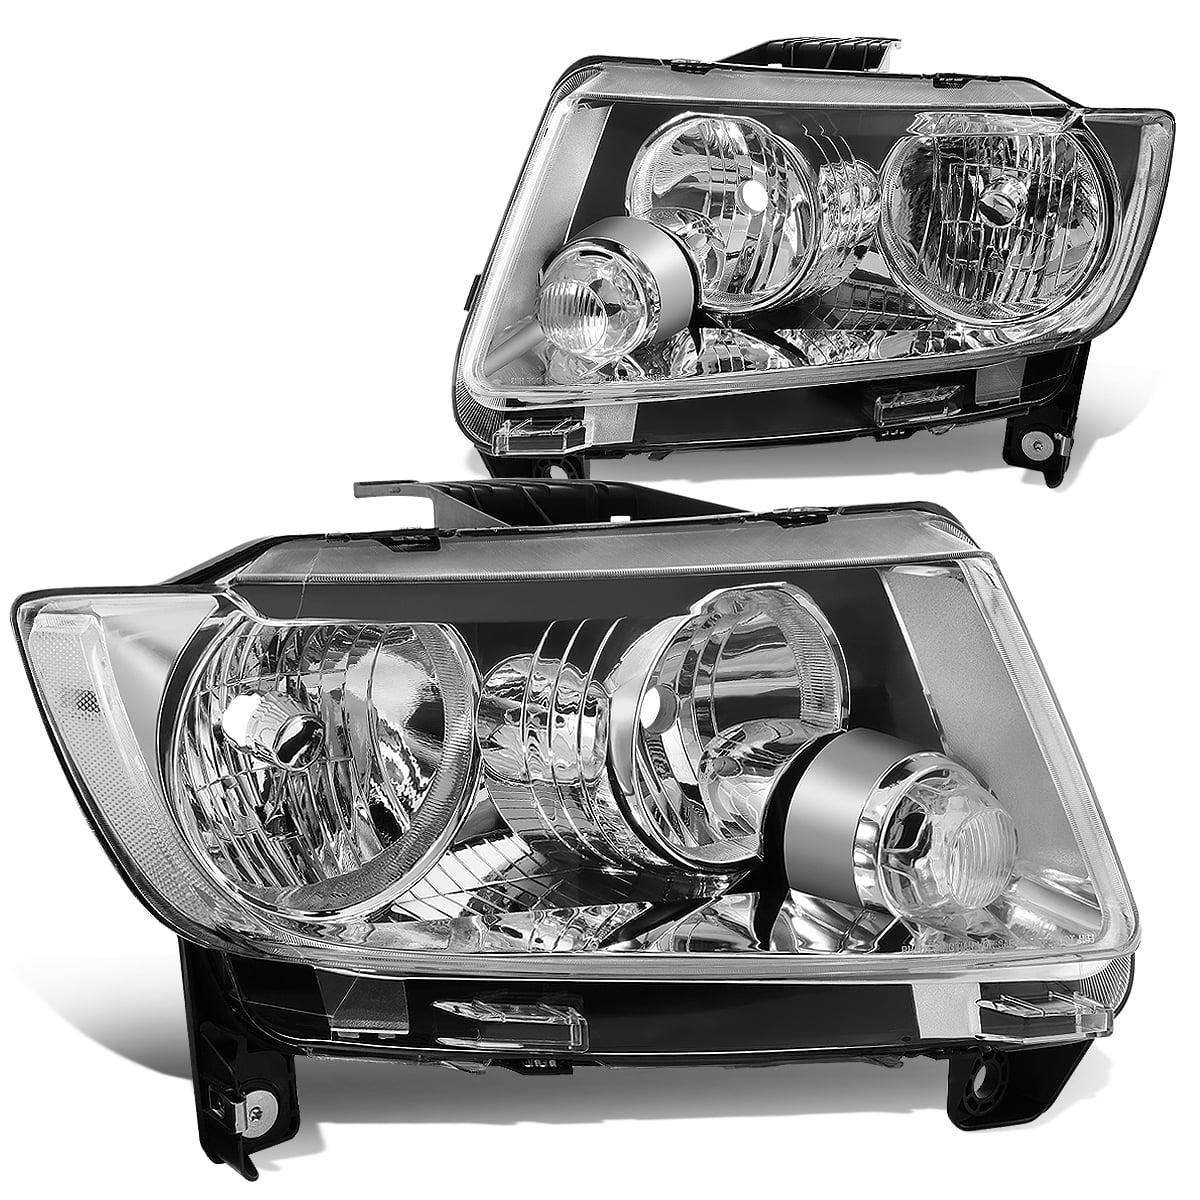 Chrome Housing Headlight Clear Corner Reflector for 11-13 Jeep Grand Cherokee